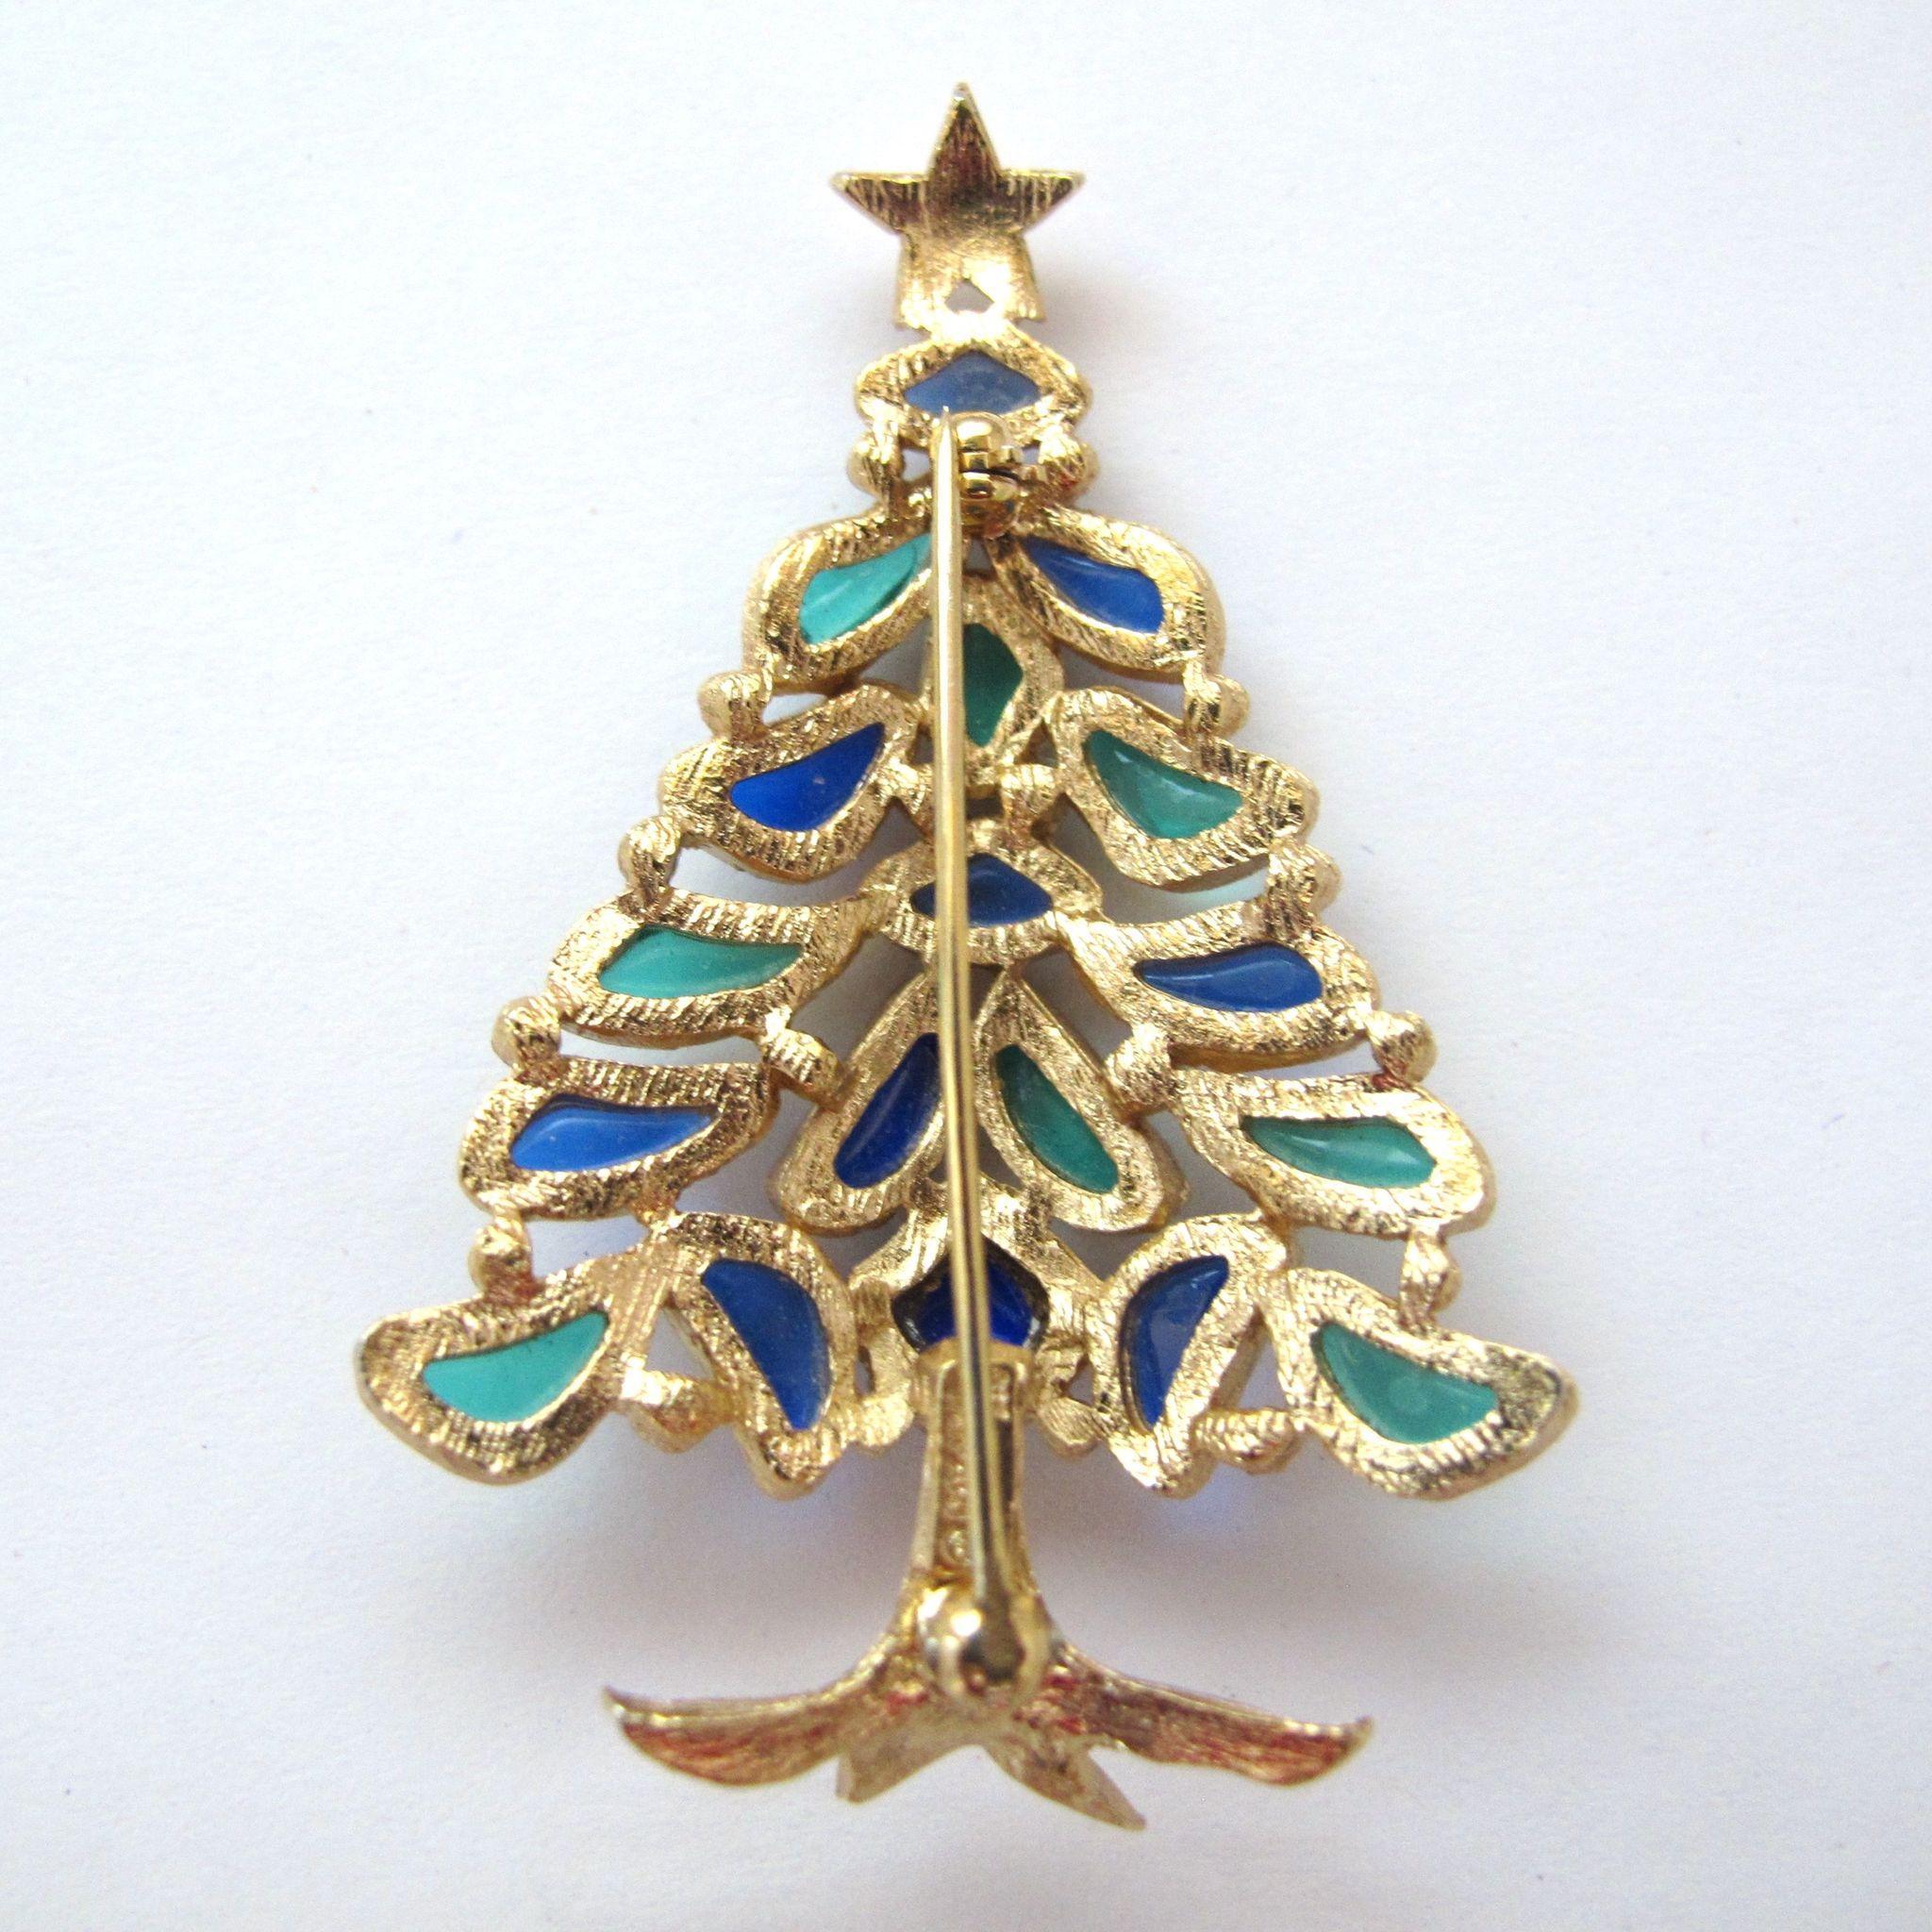 Sophisticated Christmas Tree: Crown Trifari Modern Mosaic Christmas Tree Pin